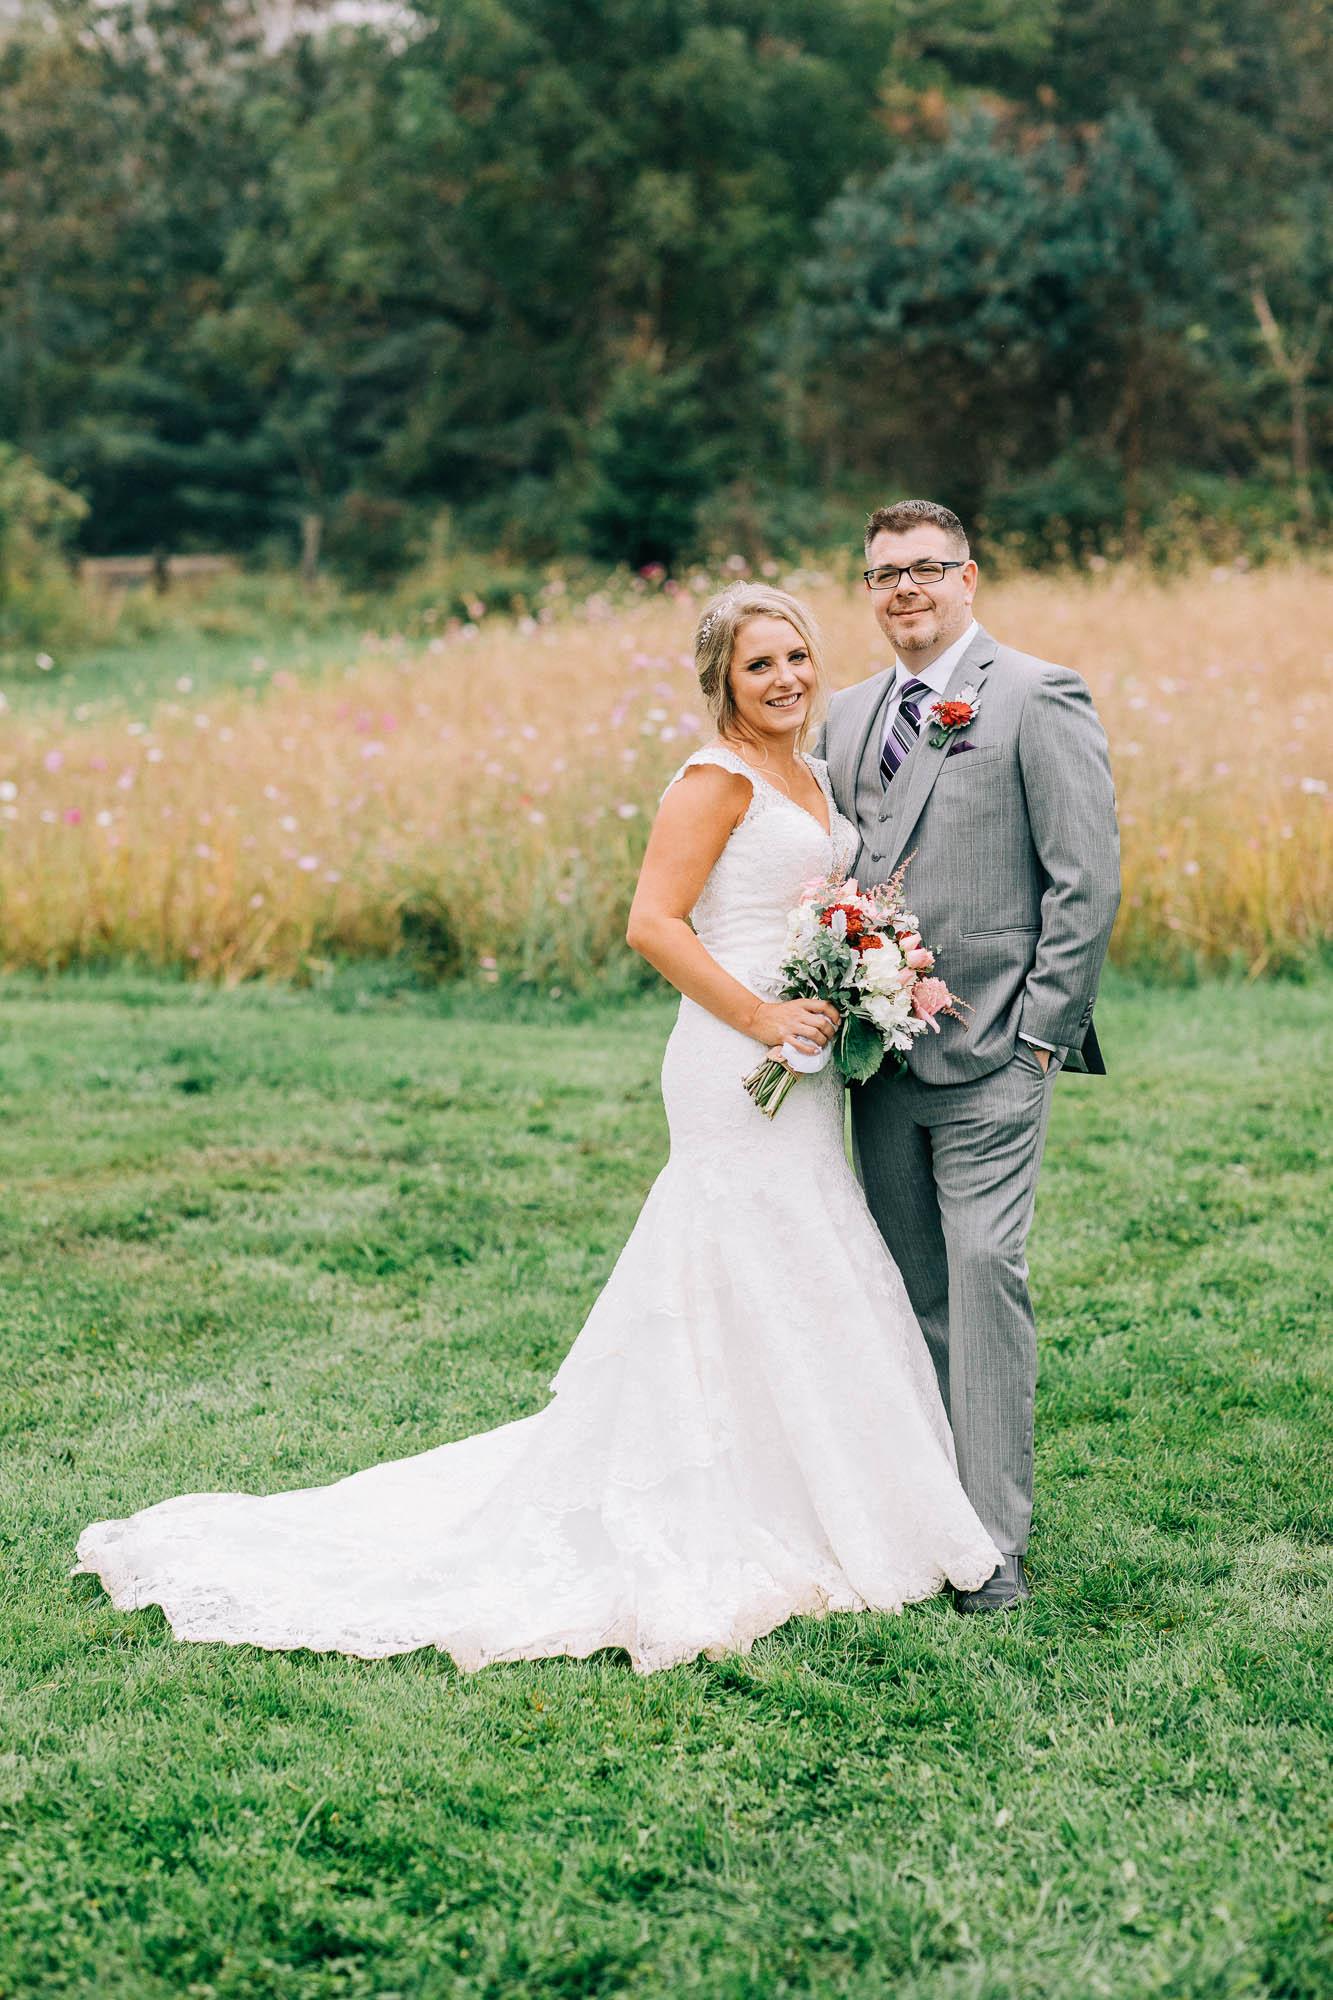 Lodge-at-Raven-Creek-October-wedding-50.jpg